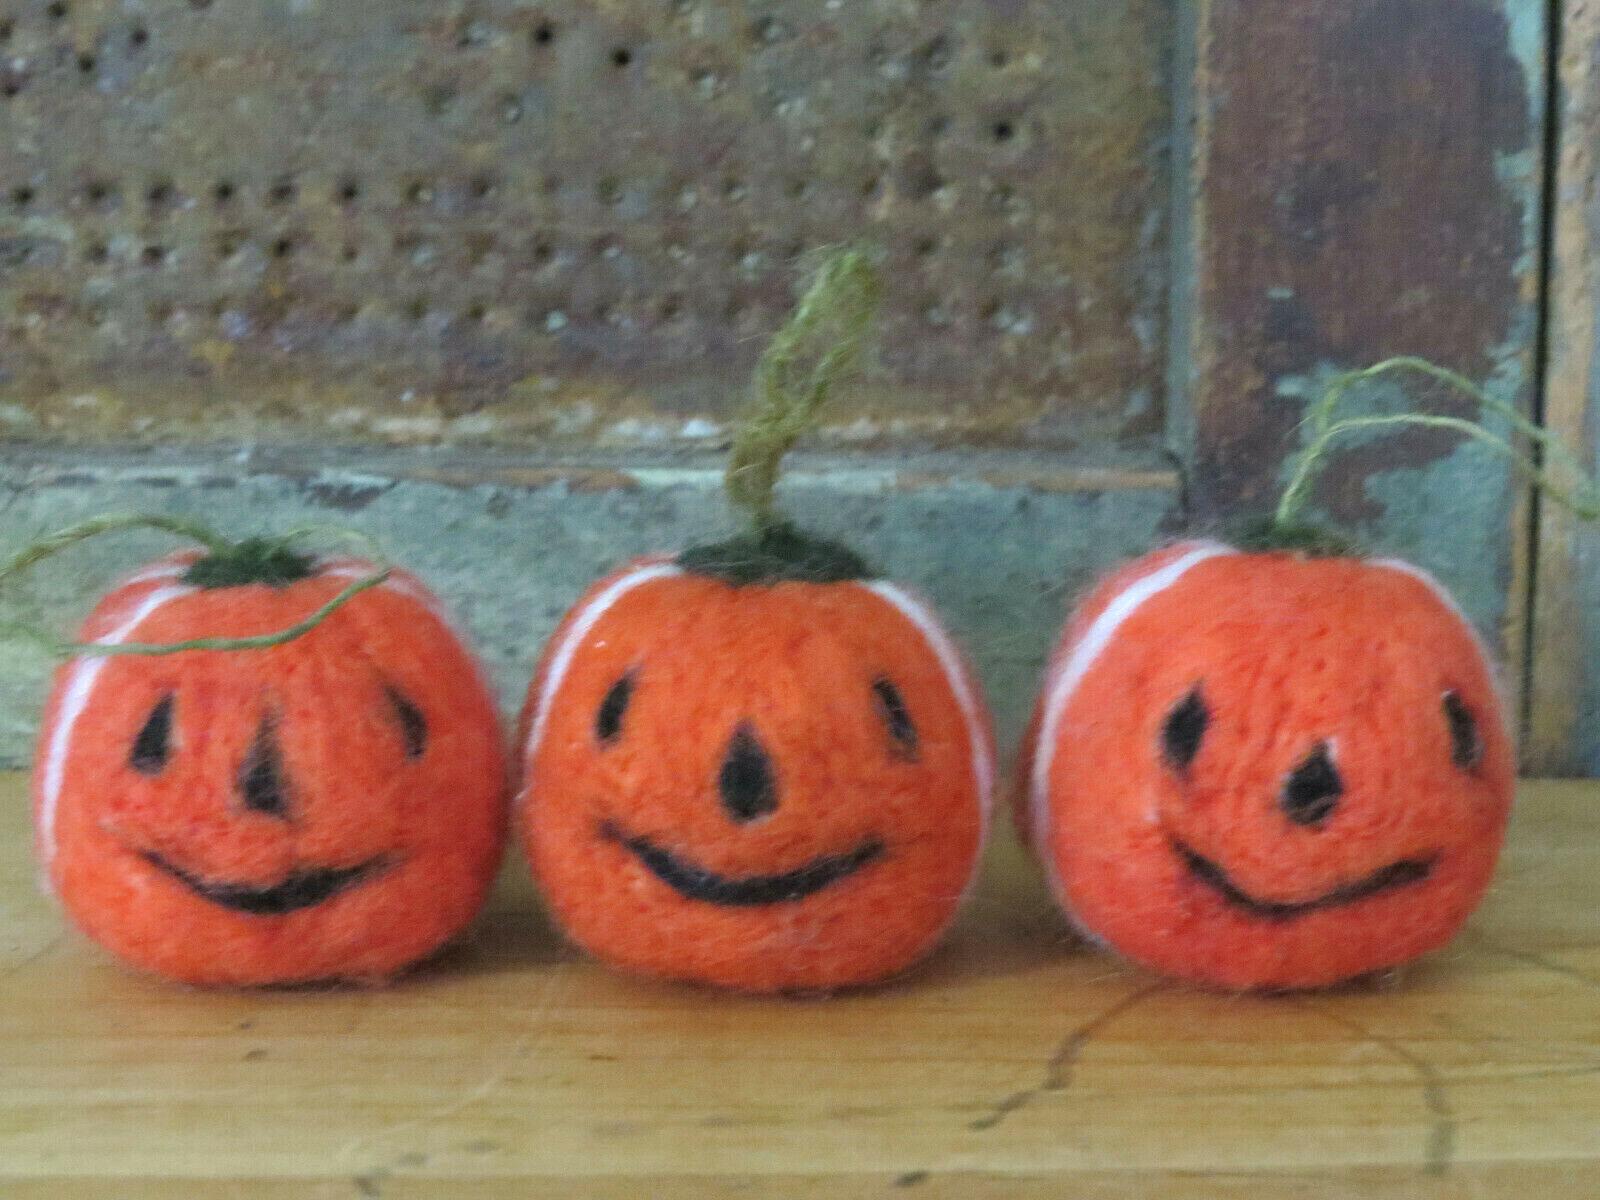 Set 3 Needlefelted Wool Halloween Pumpkins Jack o Lanterns w loops for hanging